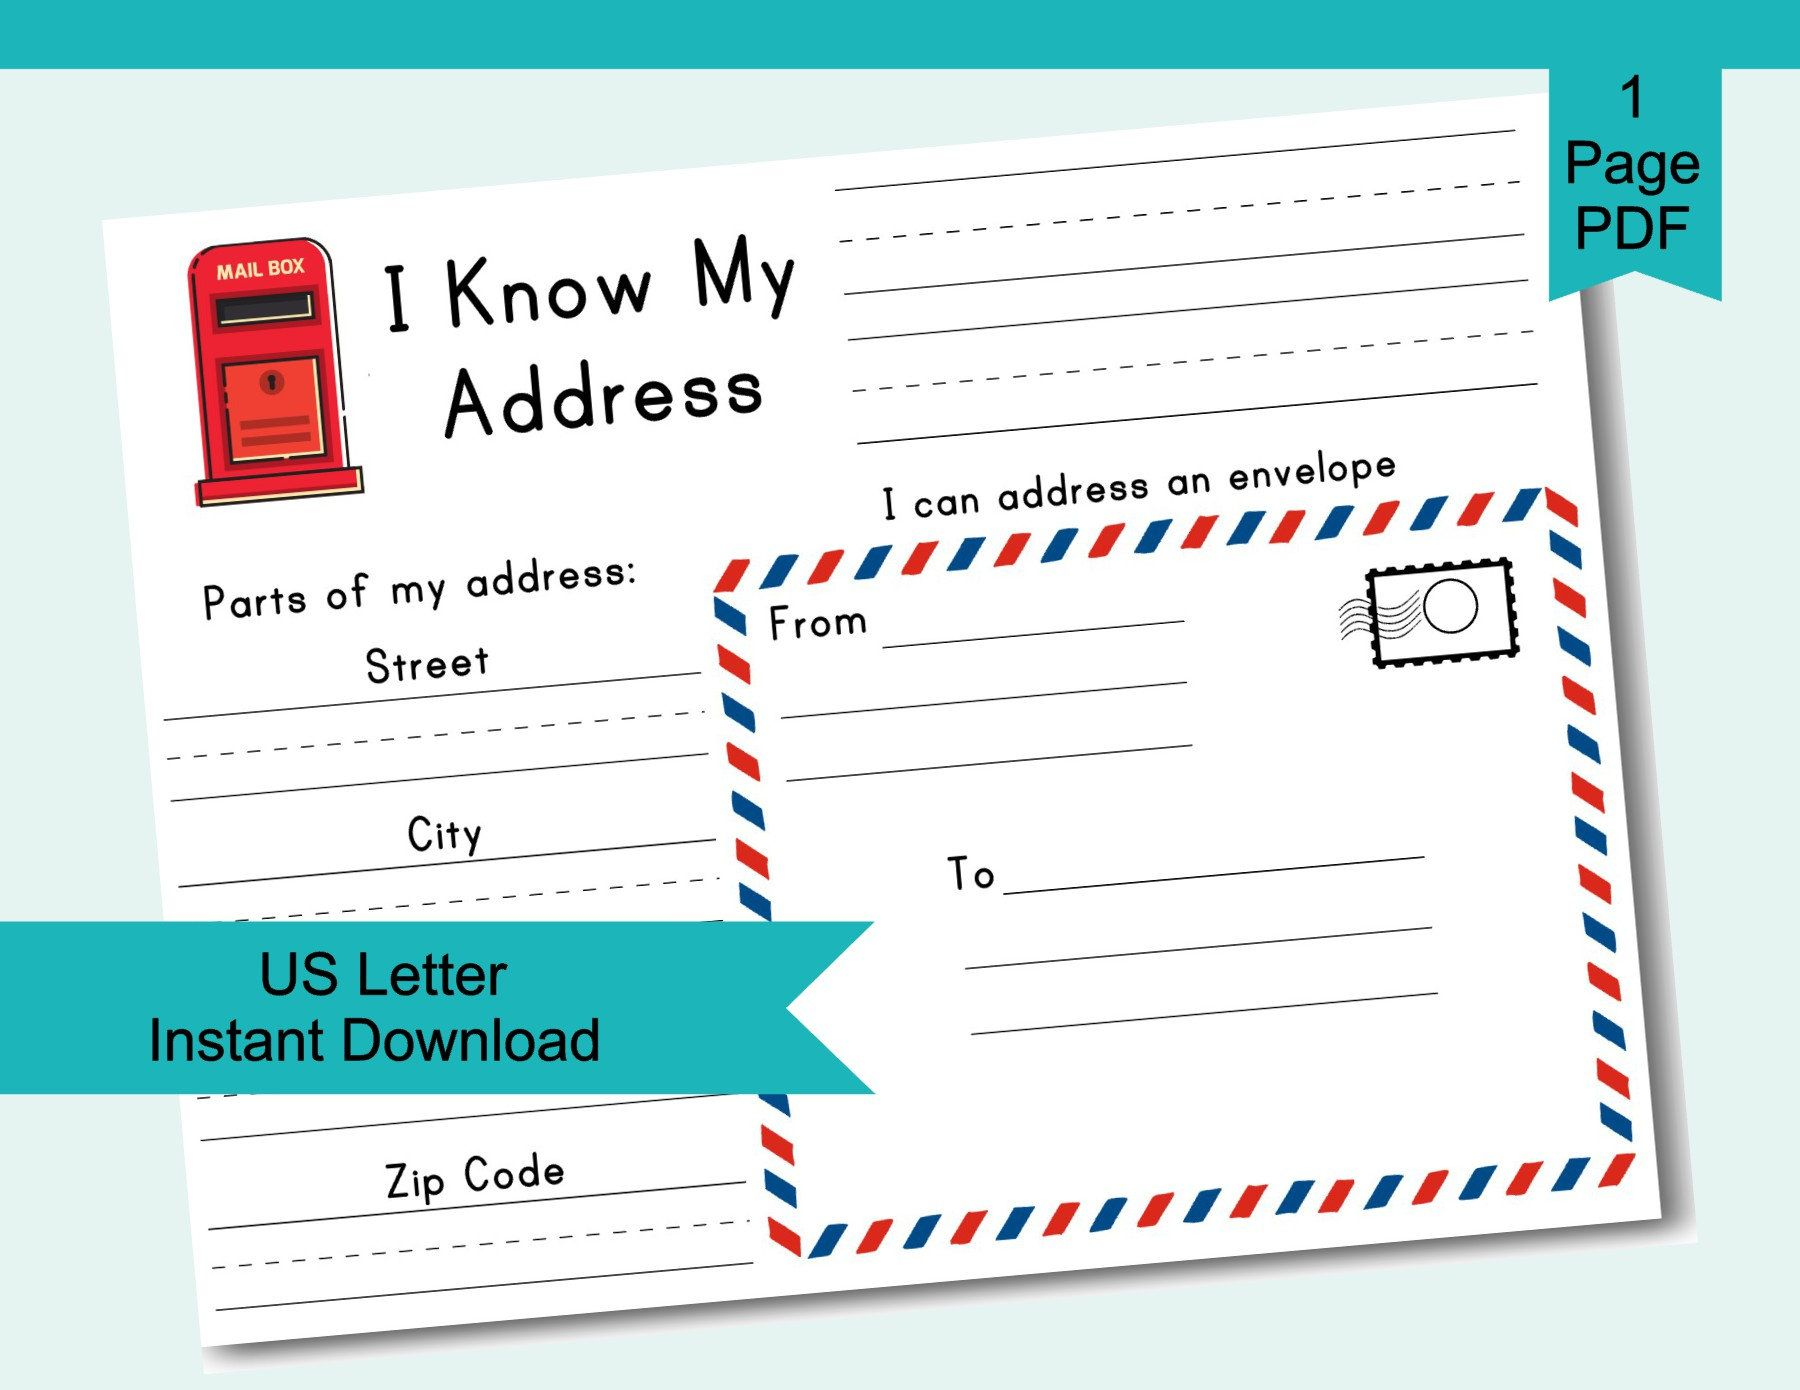 Learn My Address Worksheet Addressing Envelope Activity For   Etsy in 2021    Addressing envelopes [ 1390 x 1800 Pixel ]